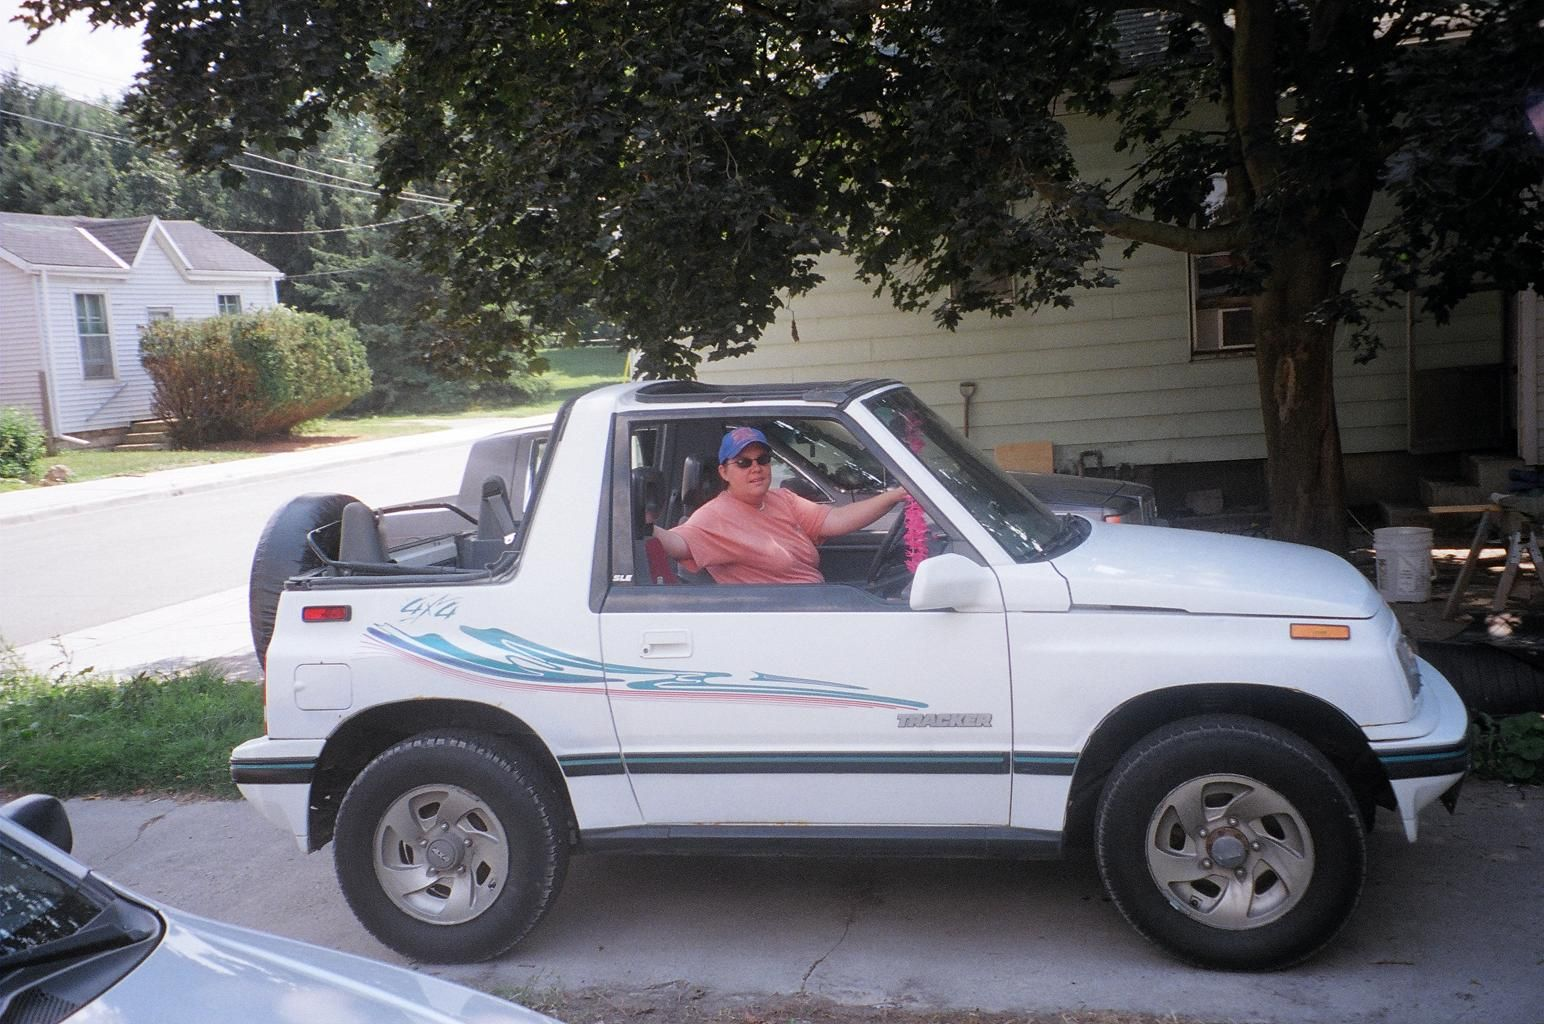 1991 Geo Tracker Stripes Cute Cars Dream Cars Car Images